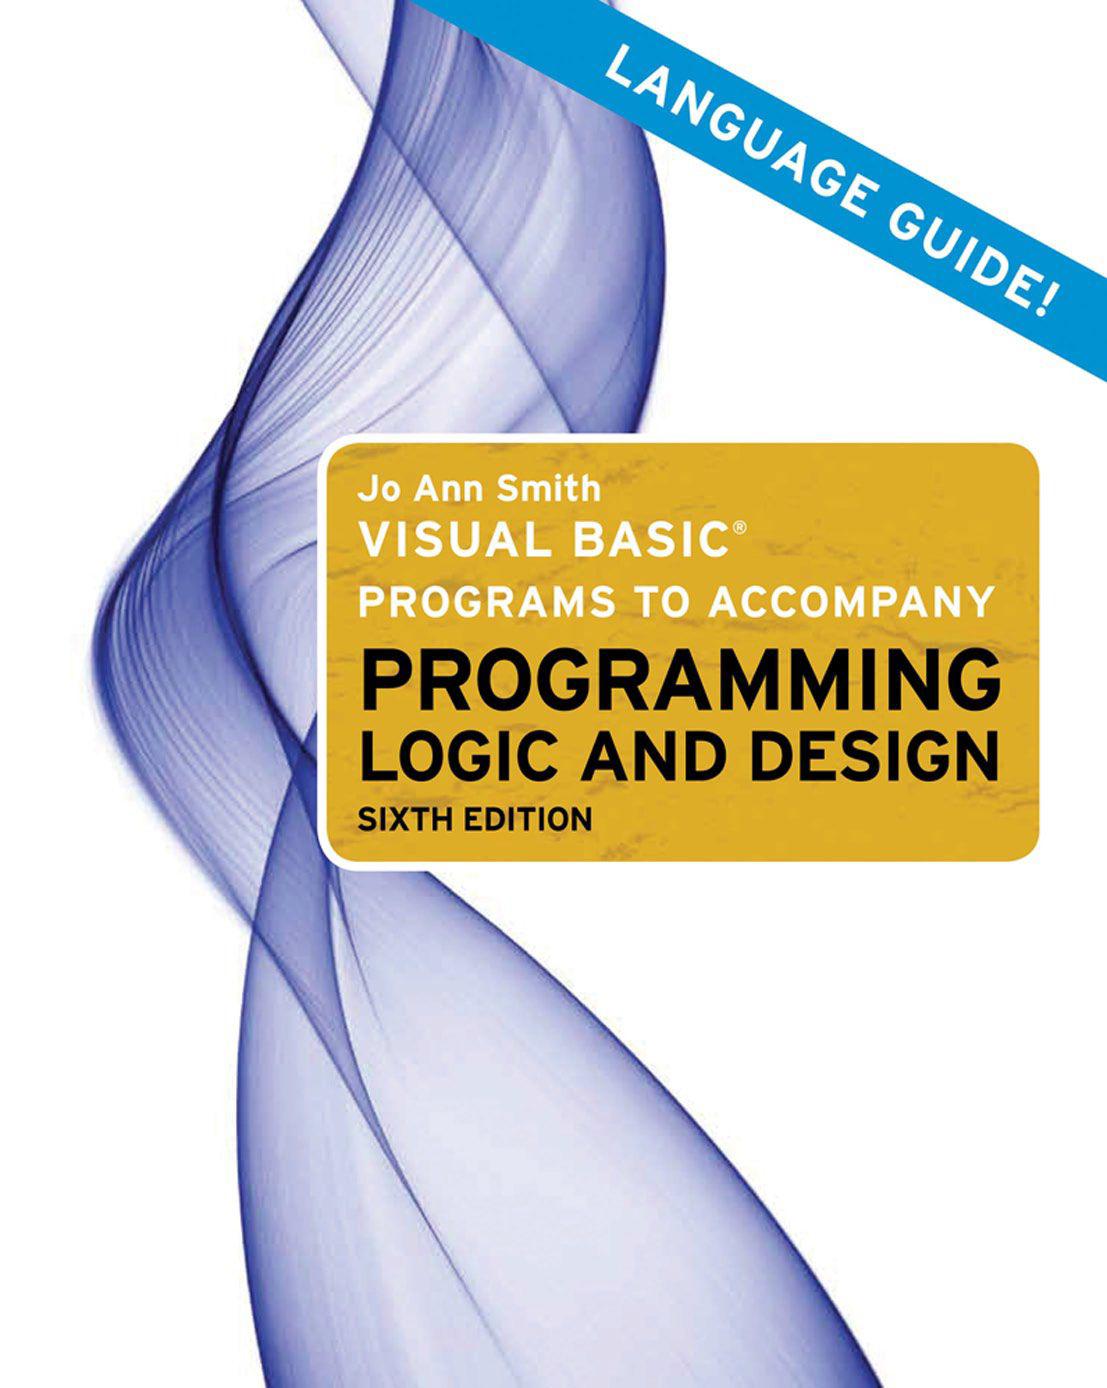 MICROSOFT® VISUAL BASIC® - PROGRAMMING LOGIC AND DESIGN : http://freecomputerbooksforyou.blogspot.com/